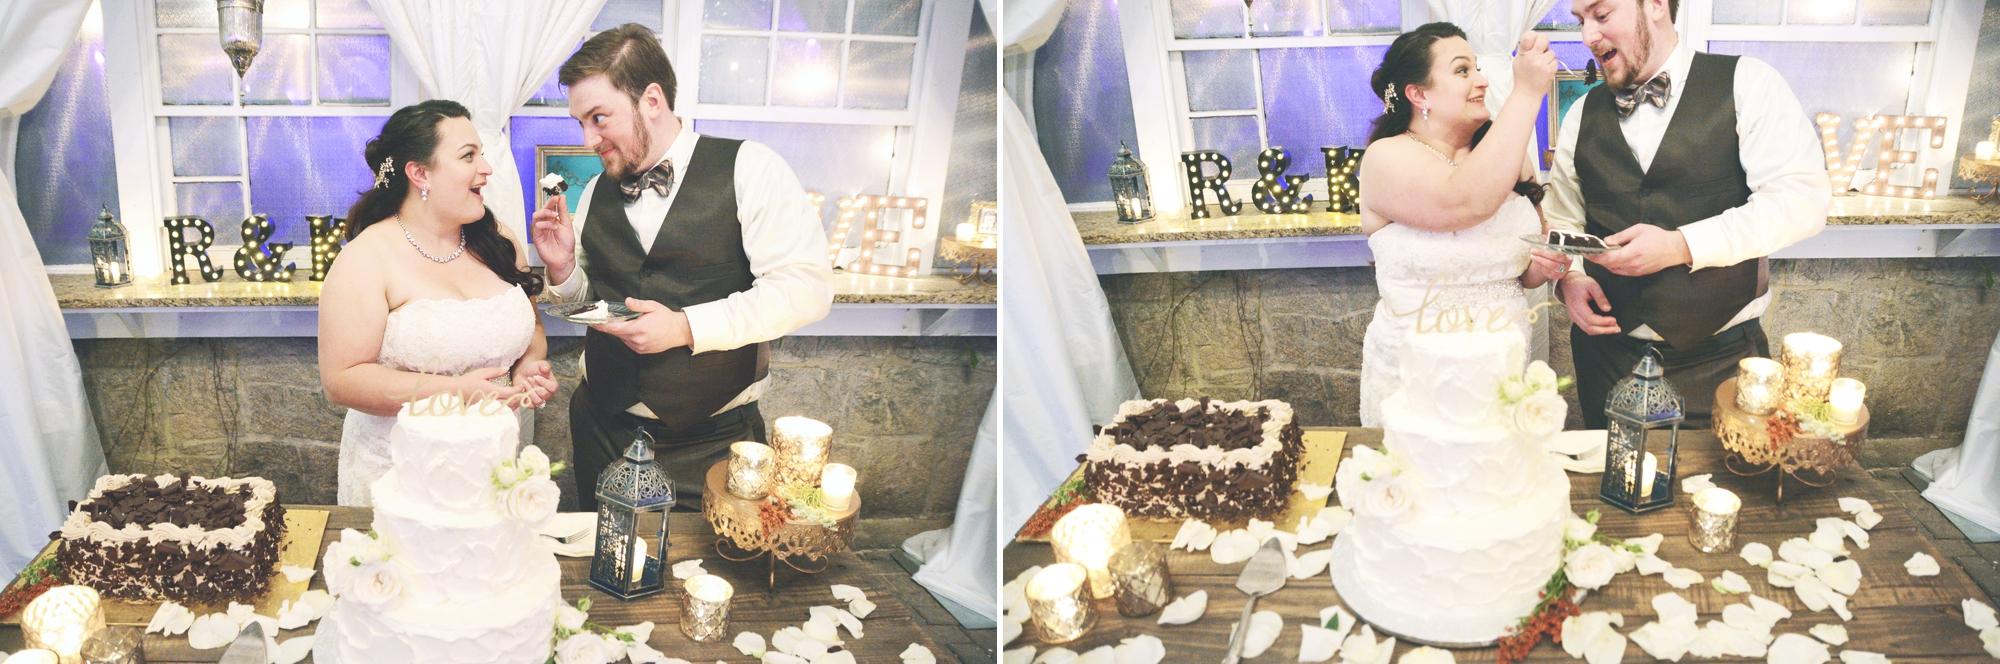 wedding-at-park-tavern-at-piedmont-park-six-hearts-photography051